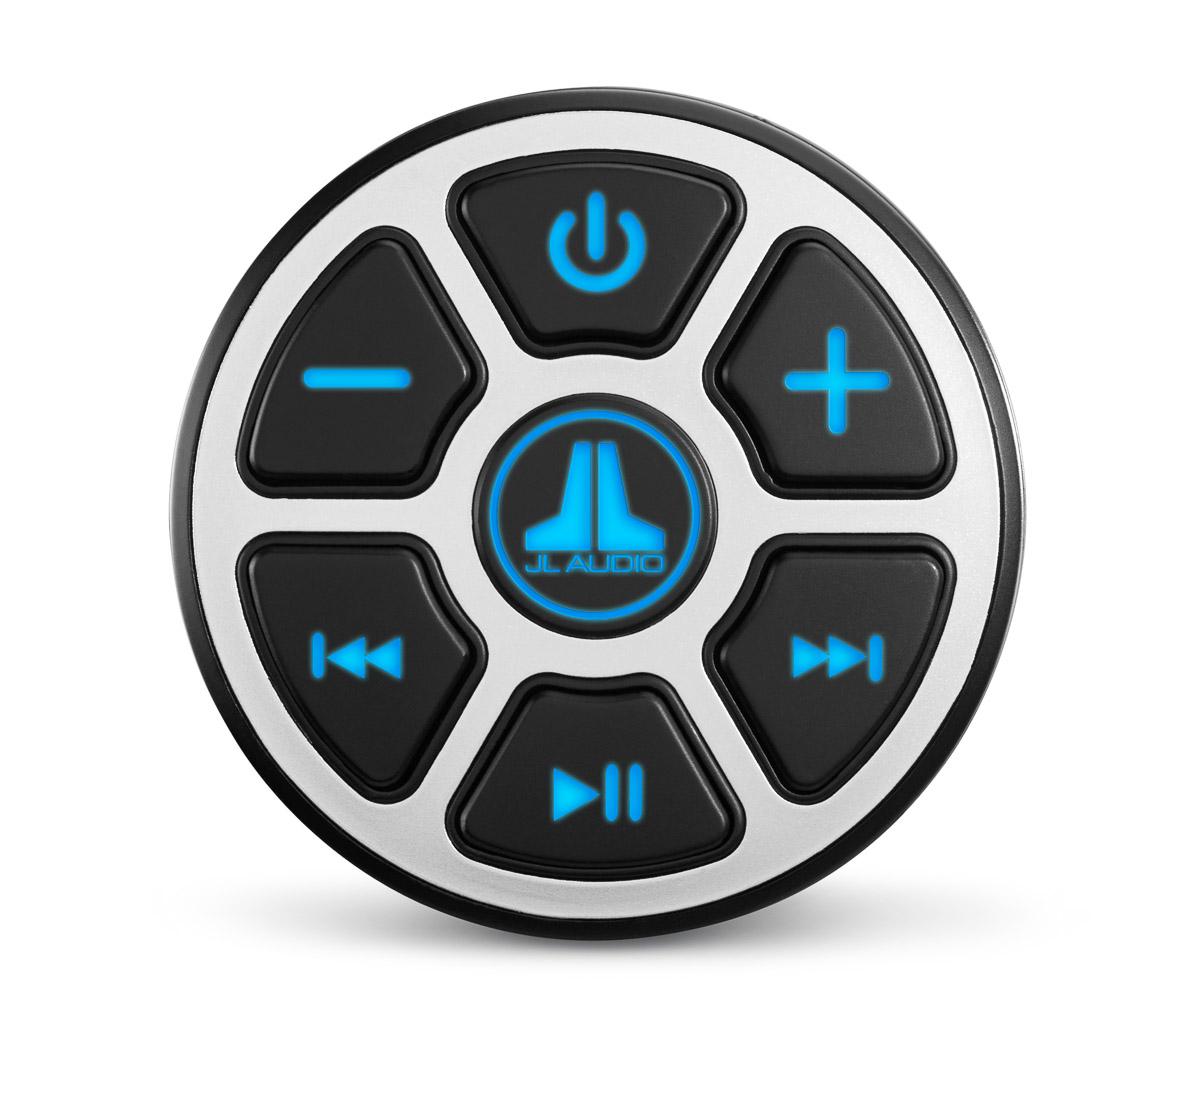 Bluetooth receiver kontrollenh